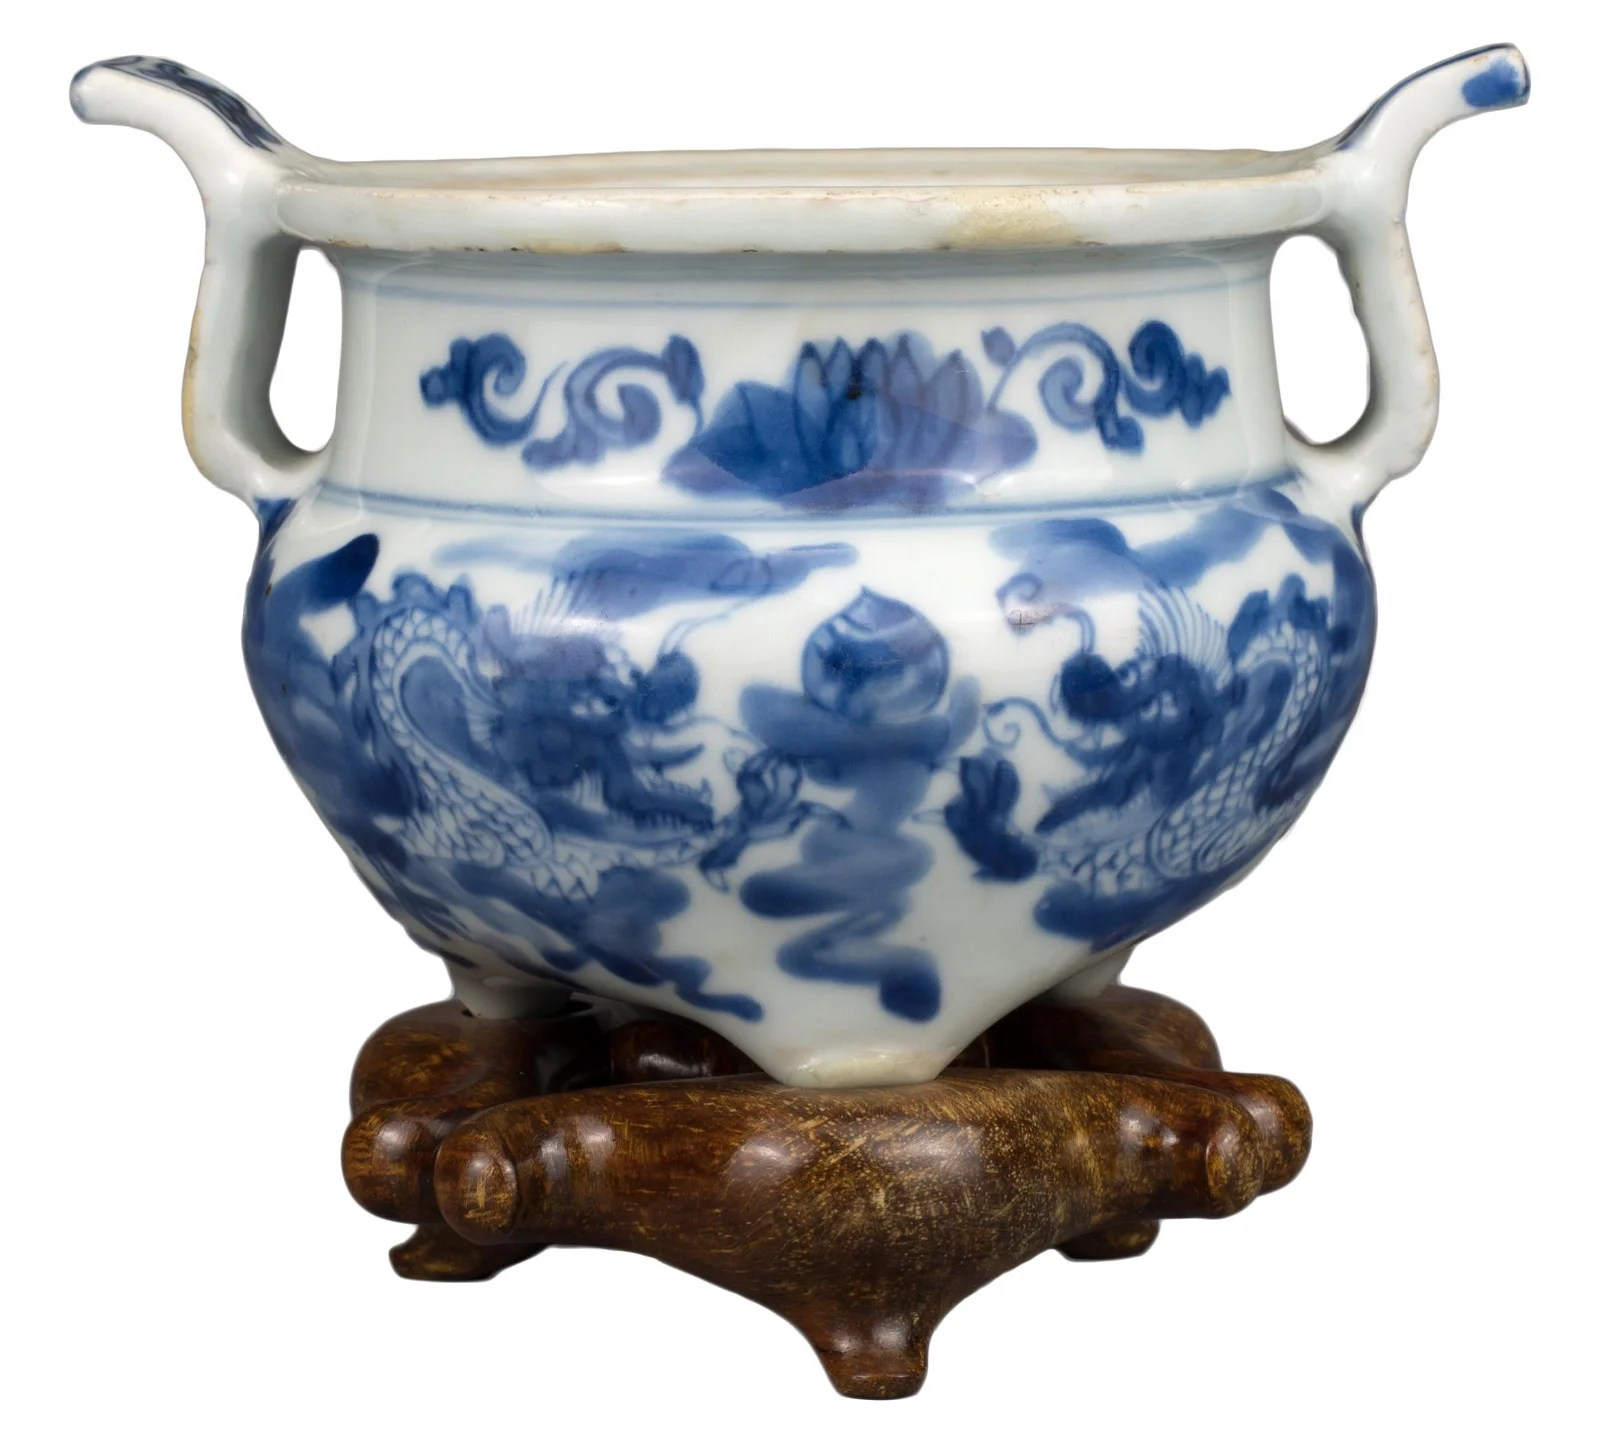 CHINESE BLUE AND WHITE PORCELAIN DRAGON CENSER, KANGXI